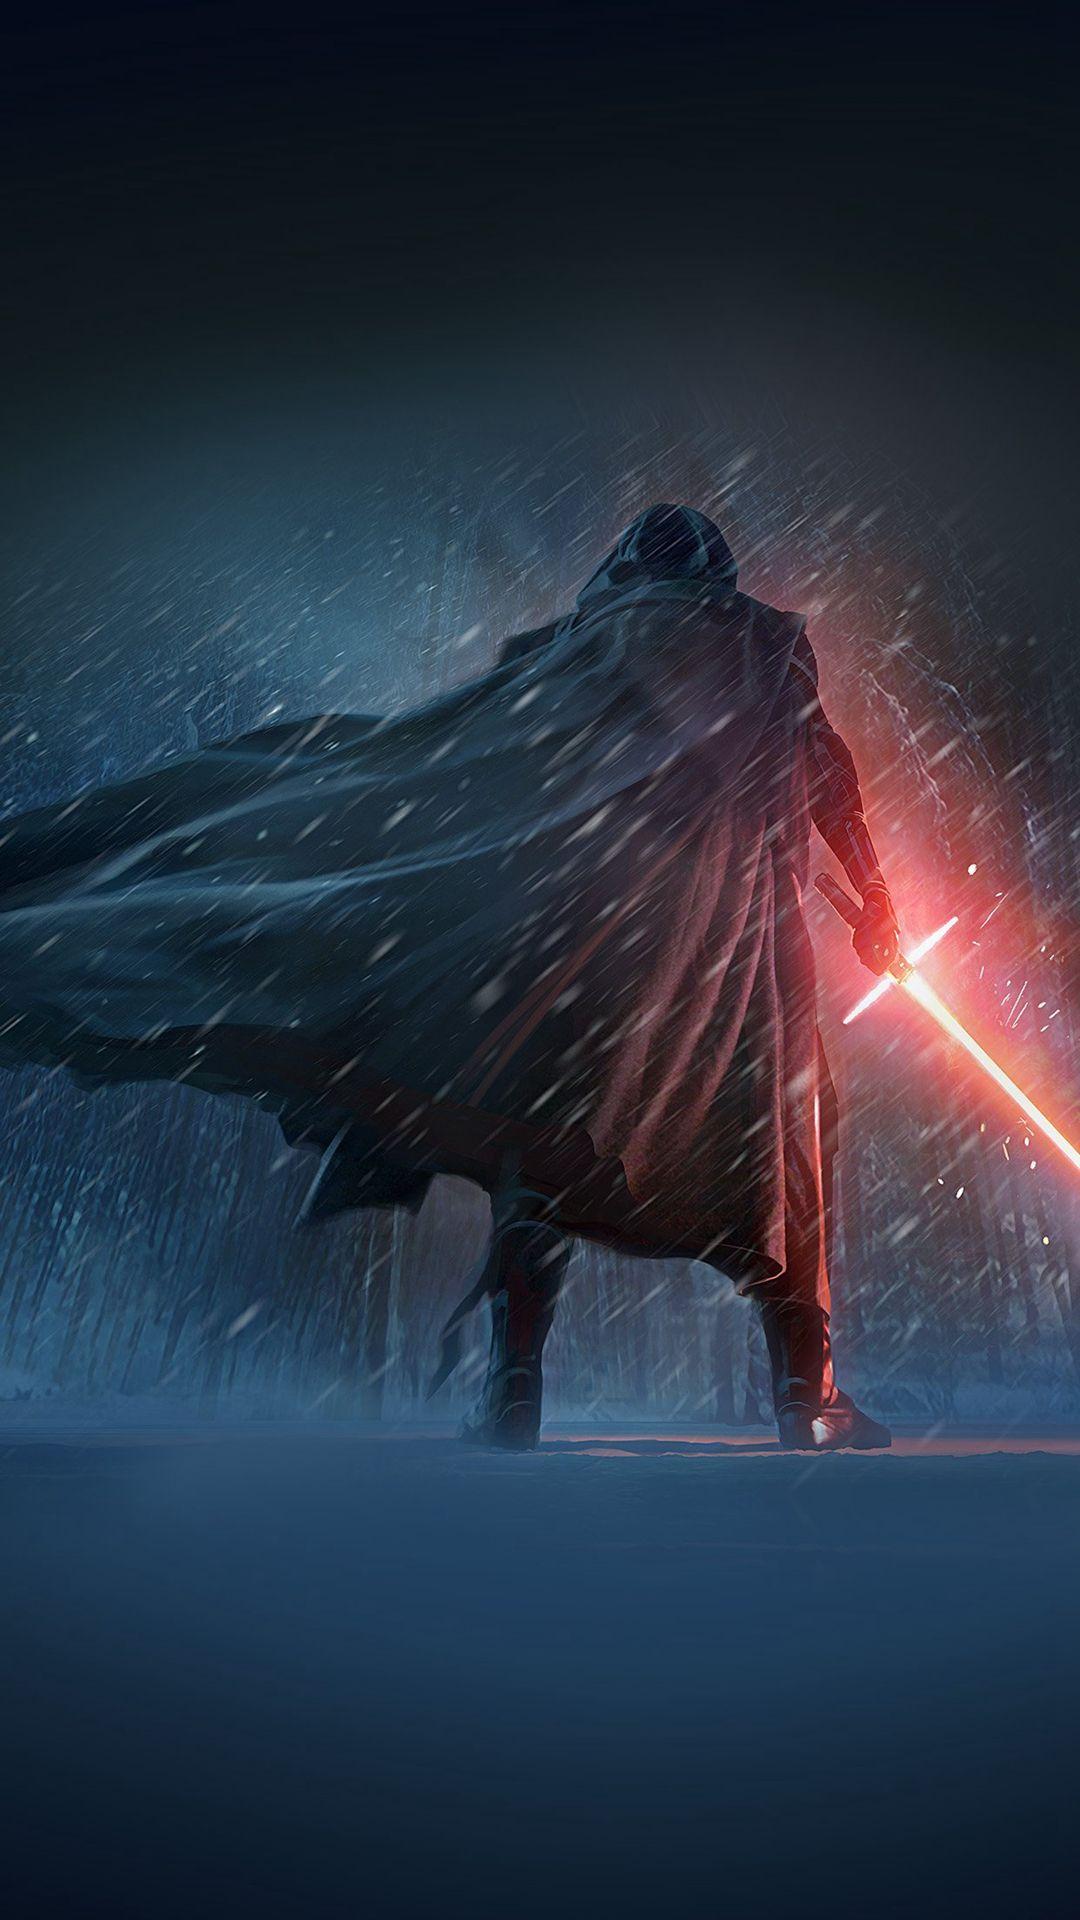 Darth Vader Starwars 7 Poster Film Art iPhone 6 Wallpaper